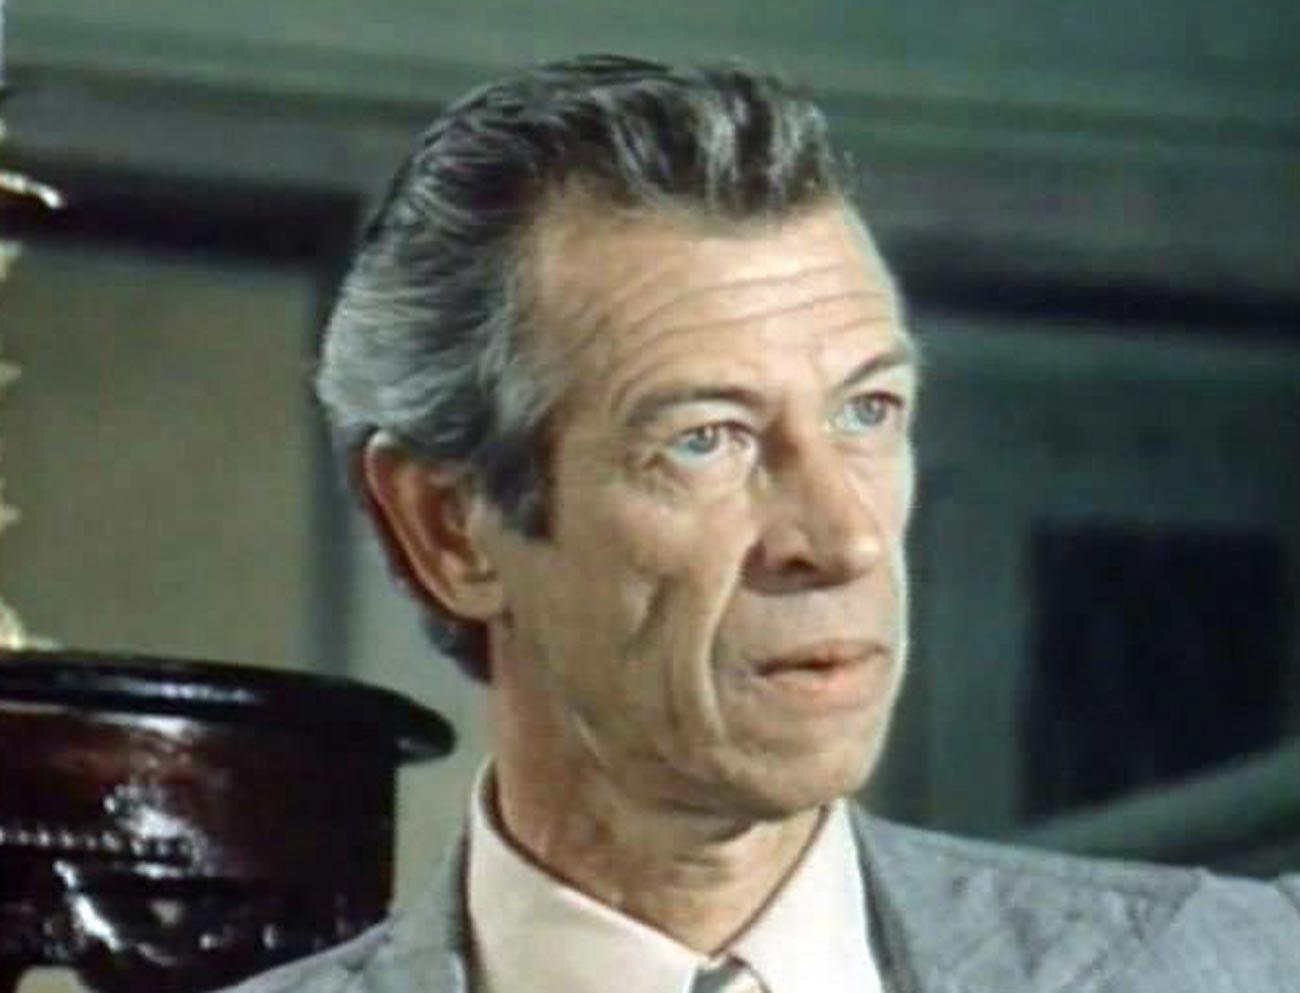 Kaljo Kiisk en la película